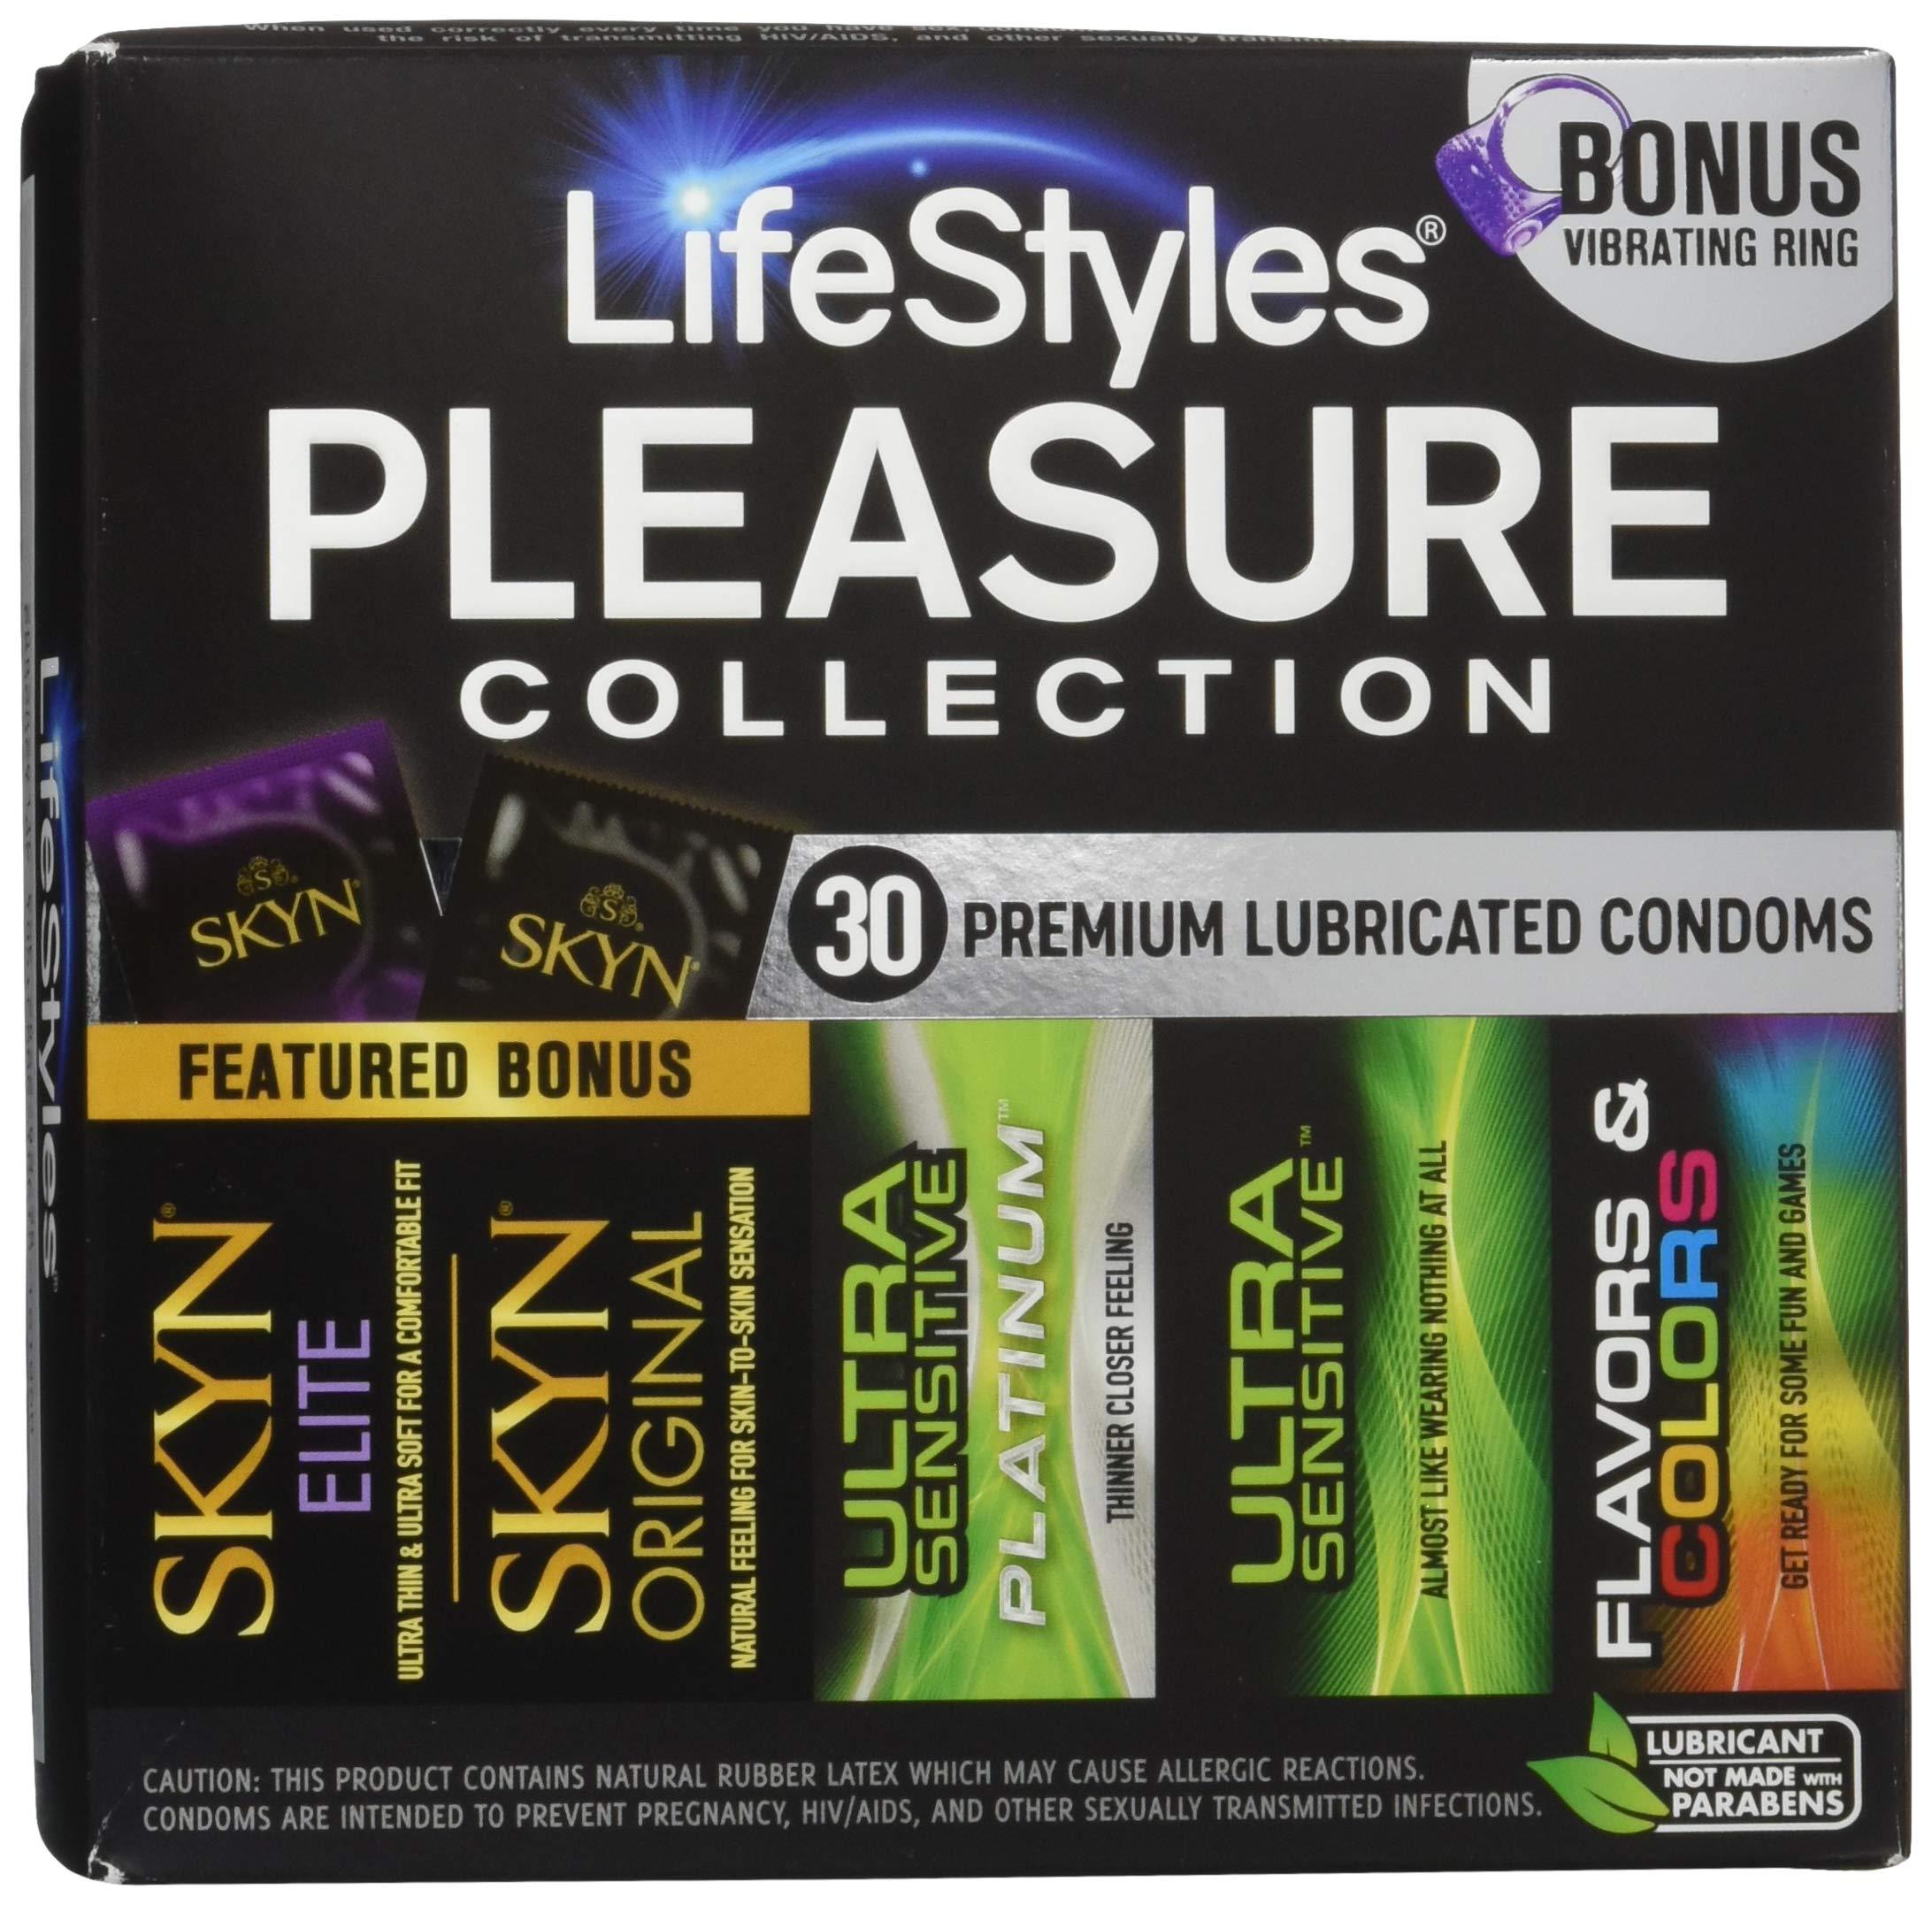 Lifestyles Pleasure Collection